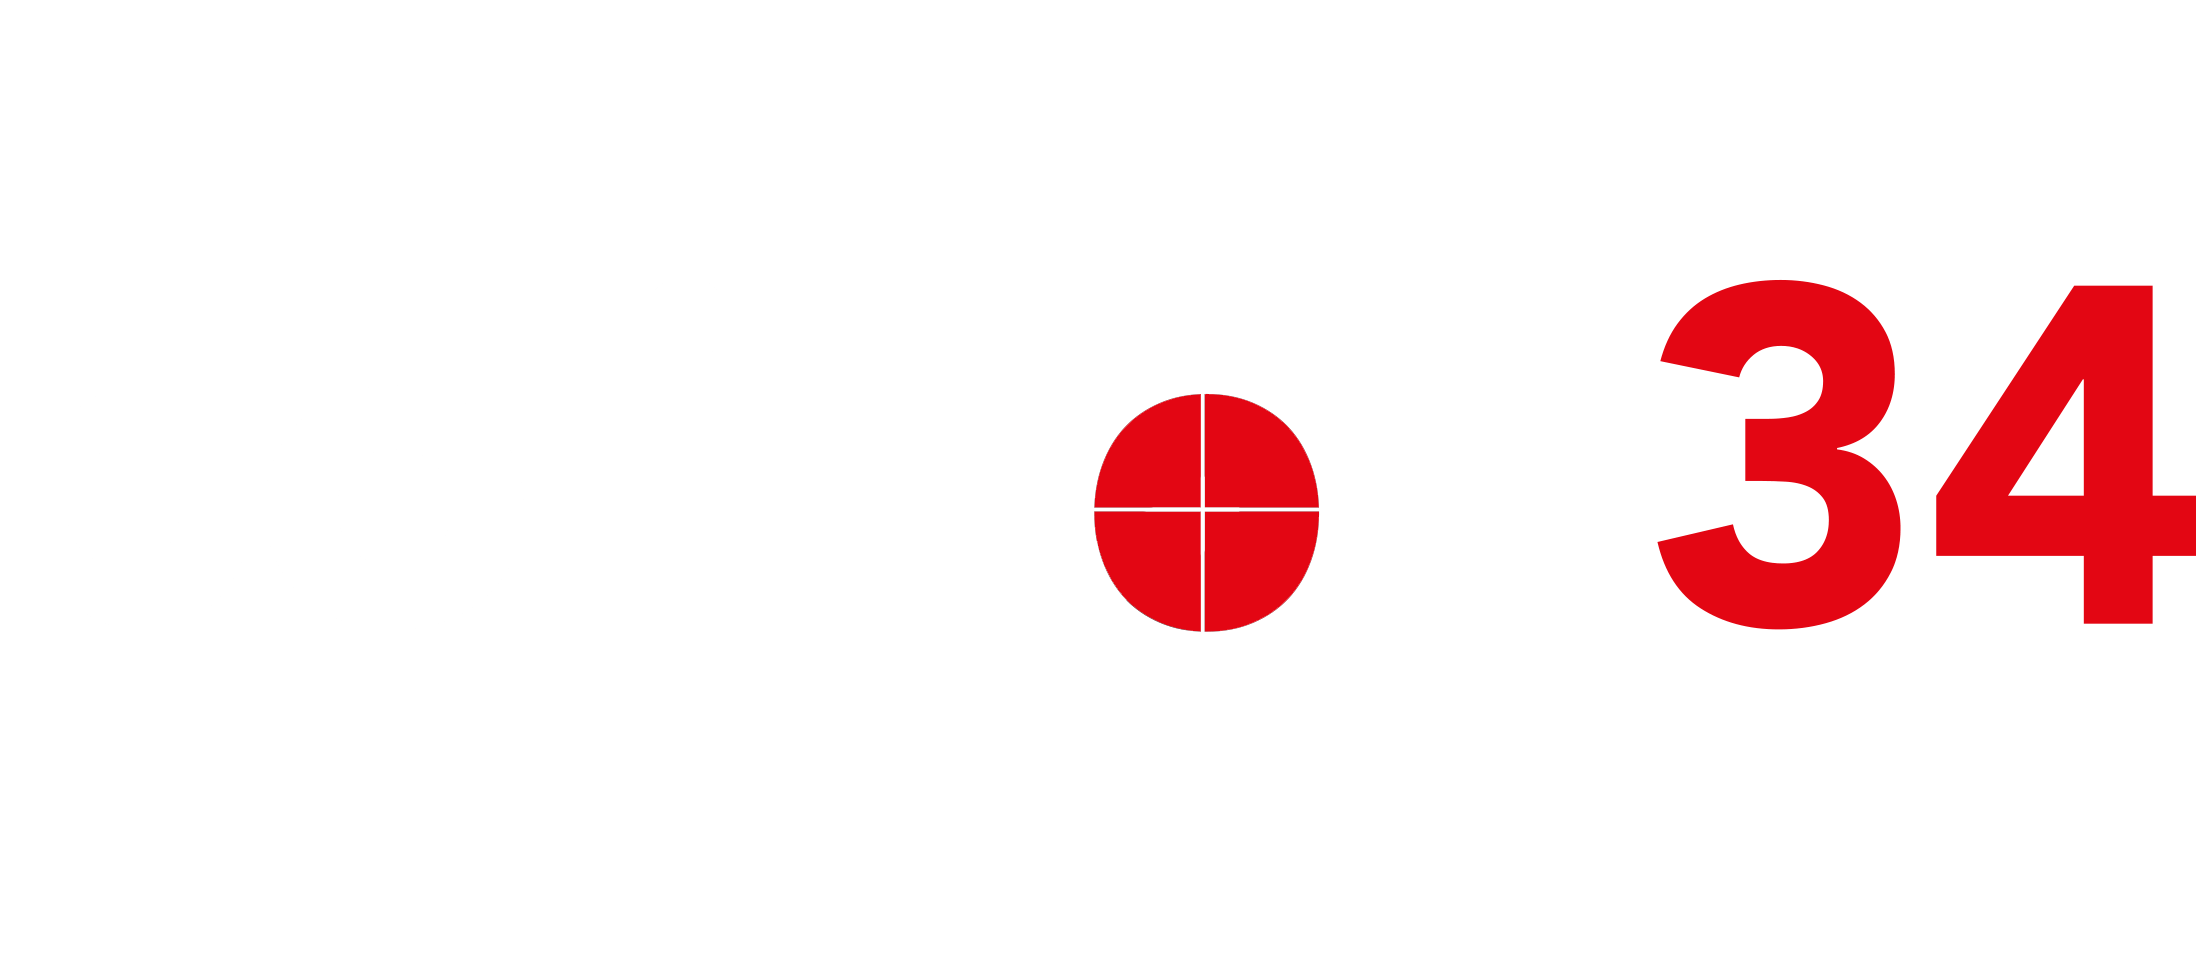 Poligon 34 | Poligon | Shooting Range | الرماية | İstanbul